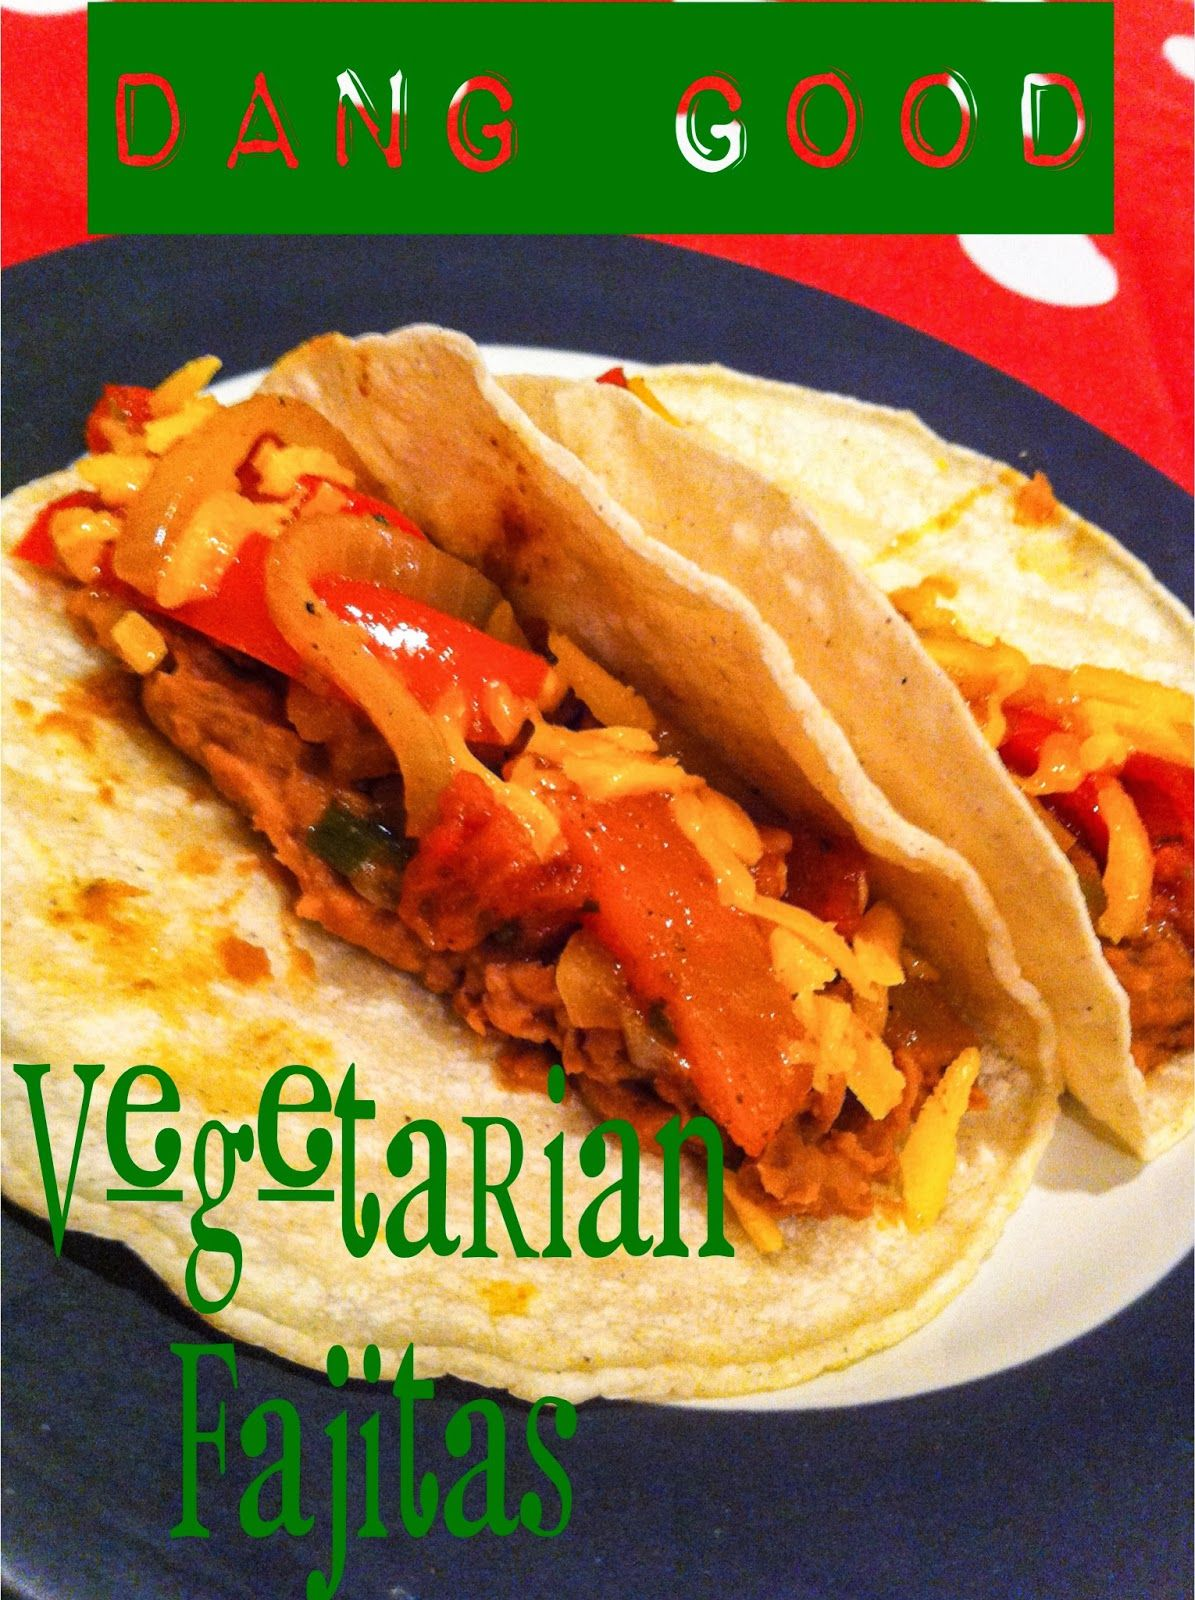 Fast and Easy Vegetarian Fajitas   Alohamora: Open a Book. Dang Good! http://alohamoraopenabook.blogspot.com/